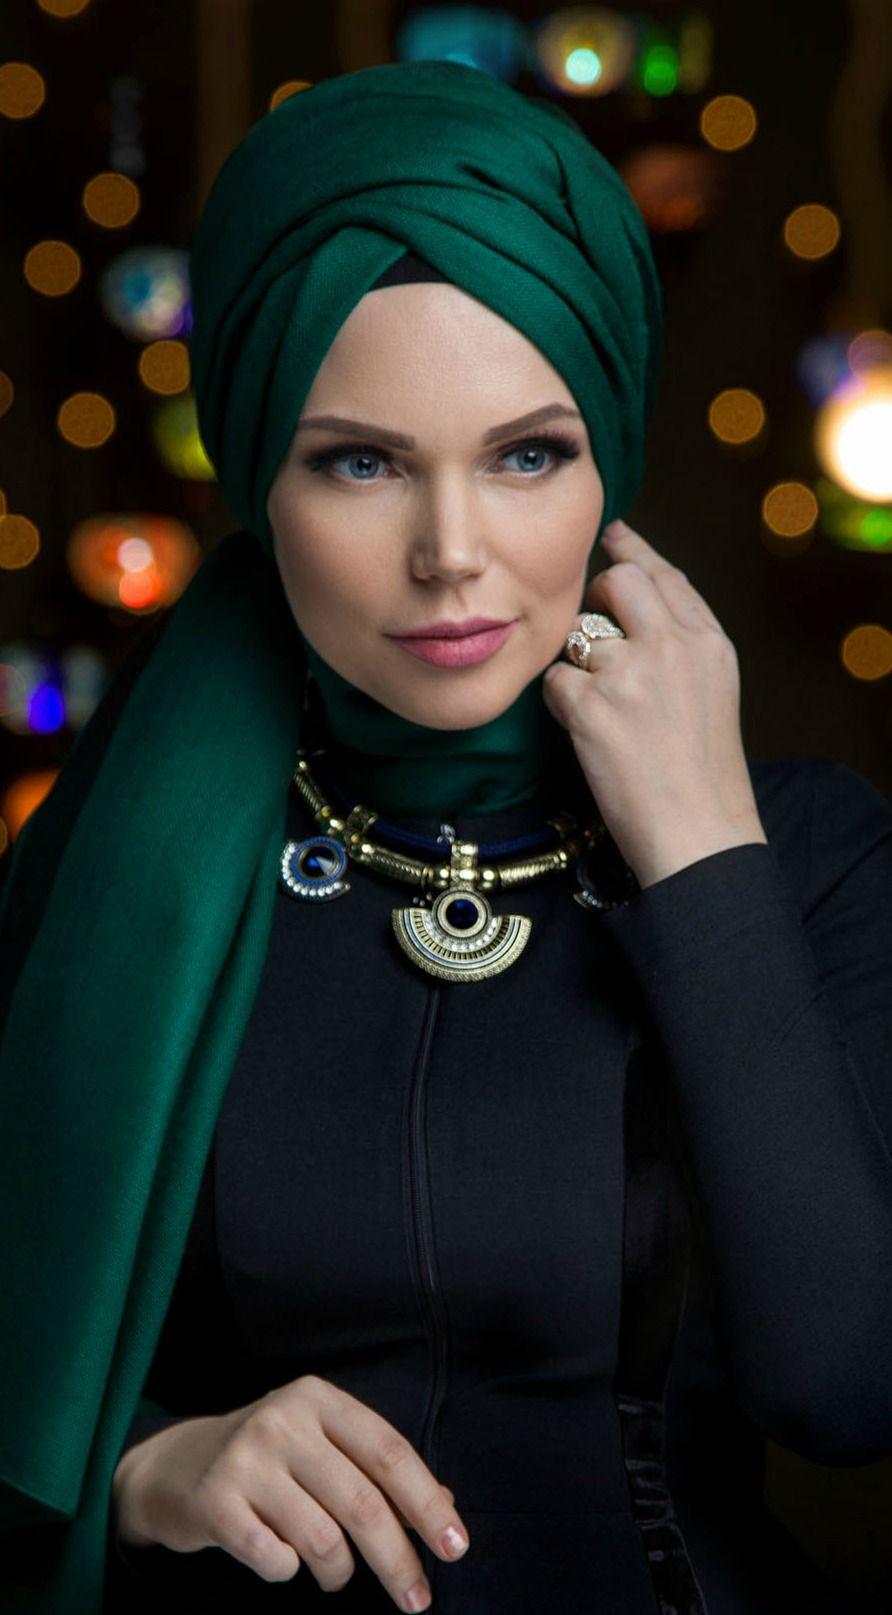 Muslima Wear Queen Hijab Emerald Green   Hijab collection